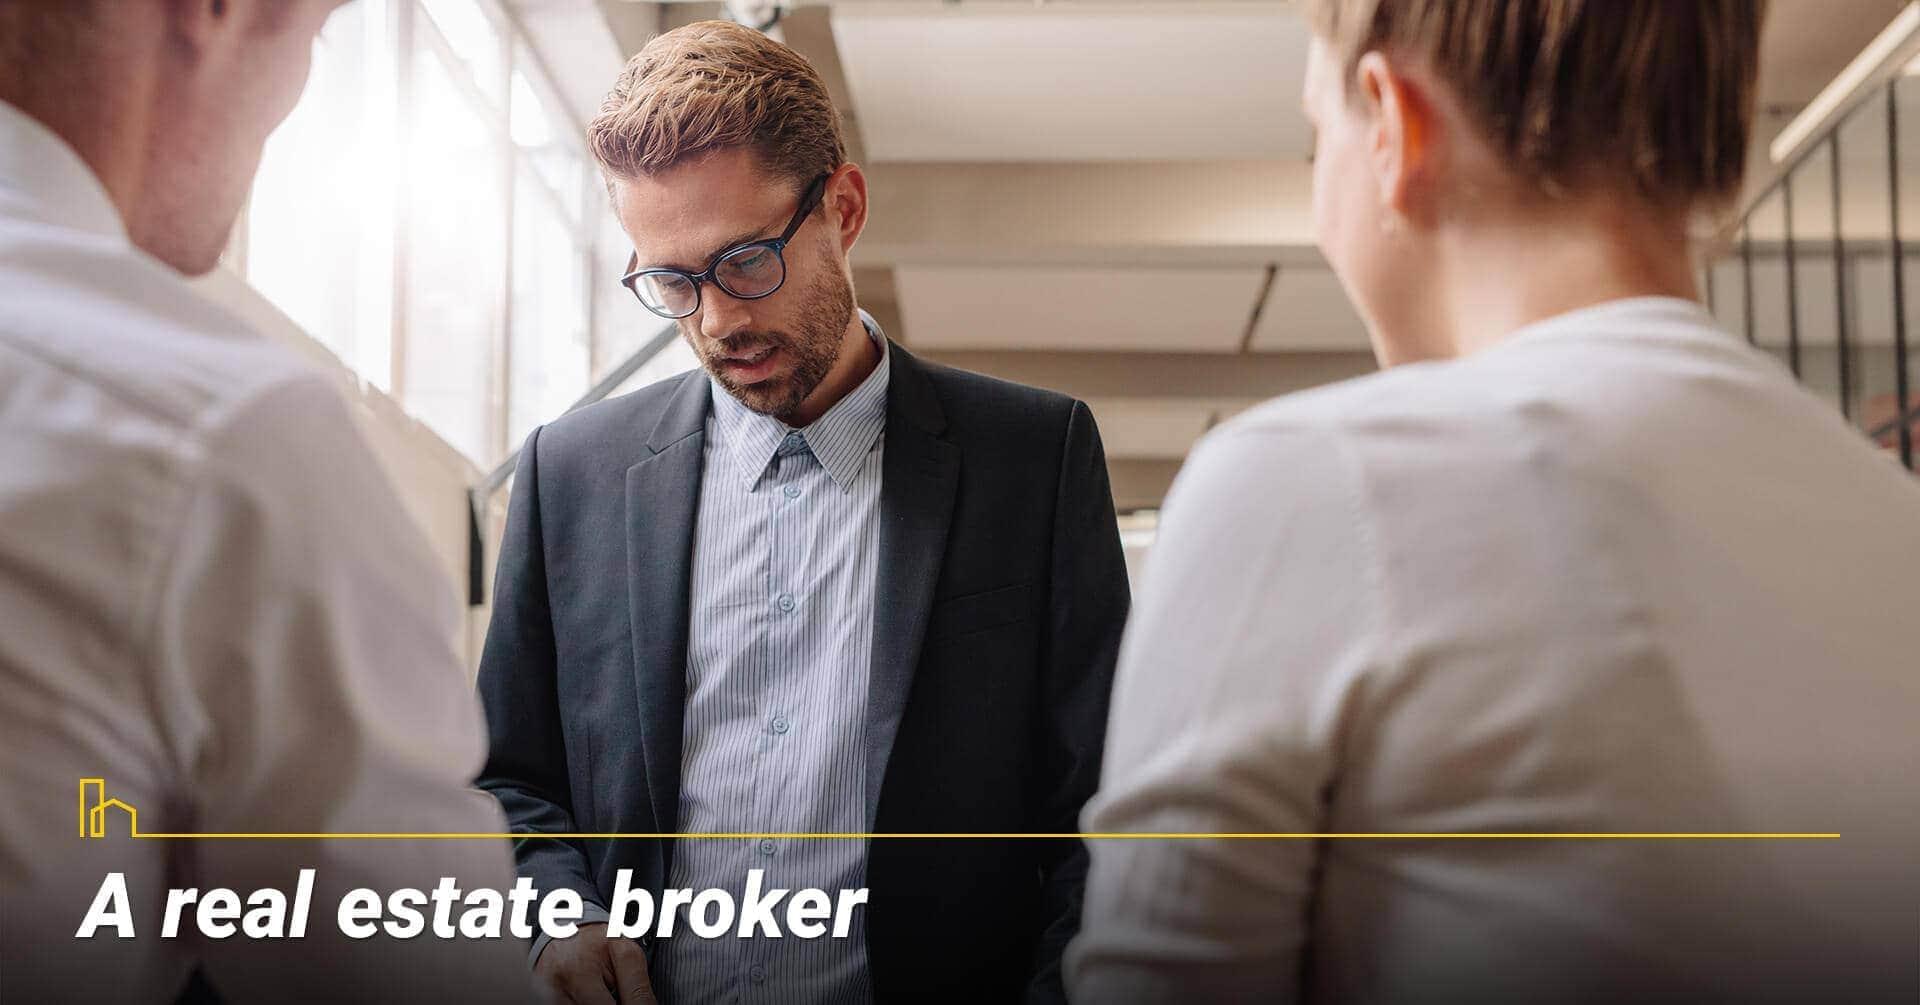 A real estate broker